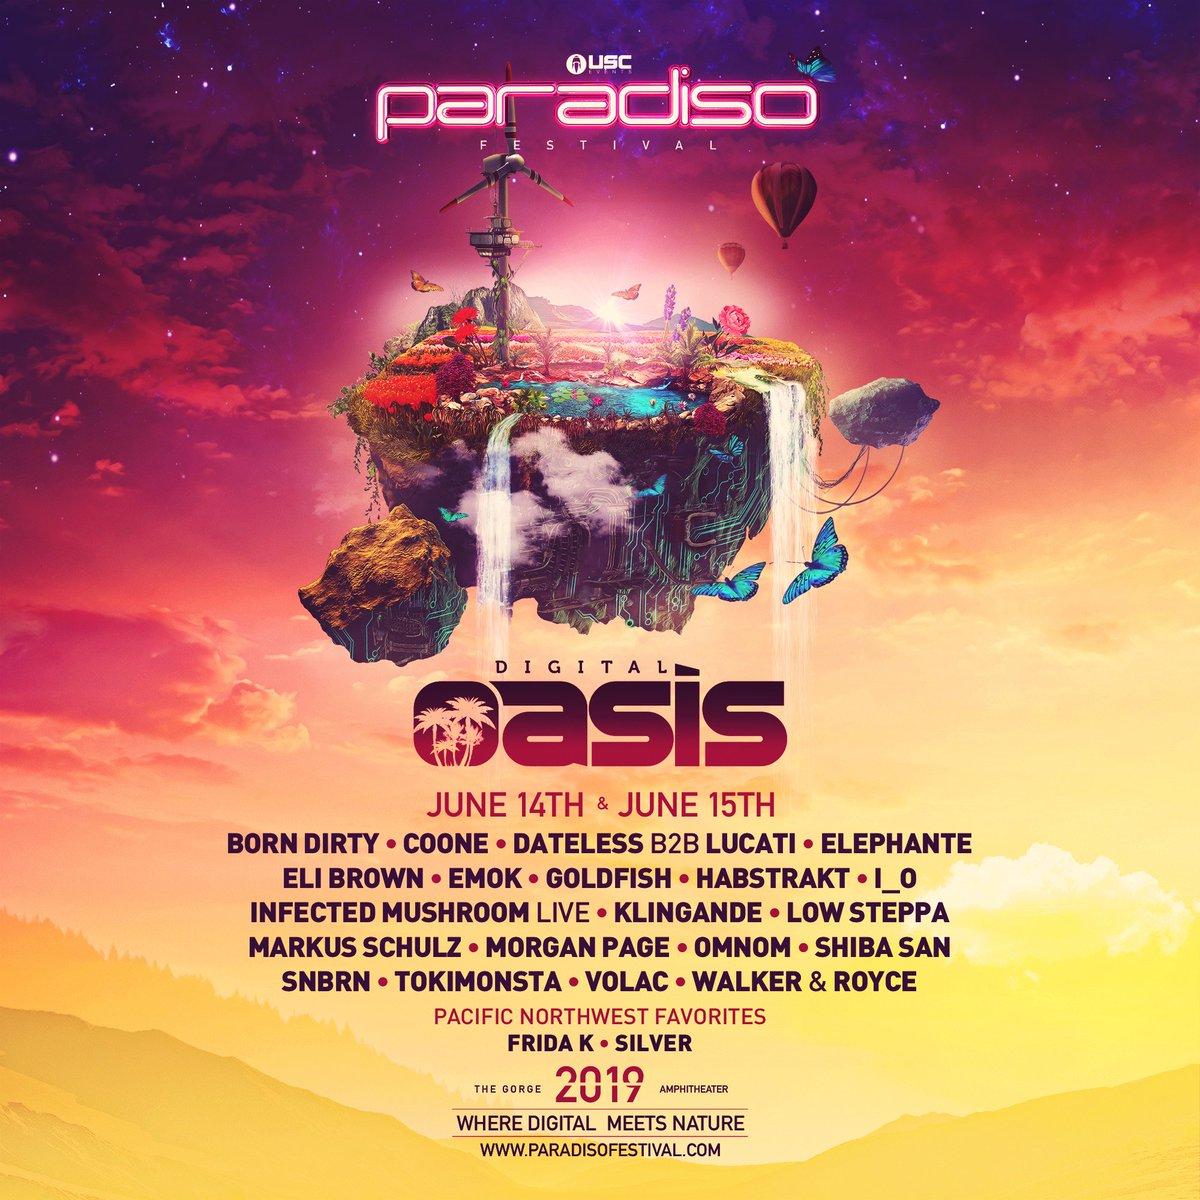 Paradiso Festival Digital Oasis lineup